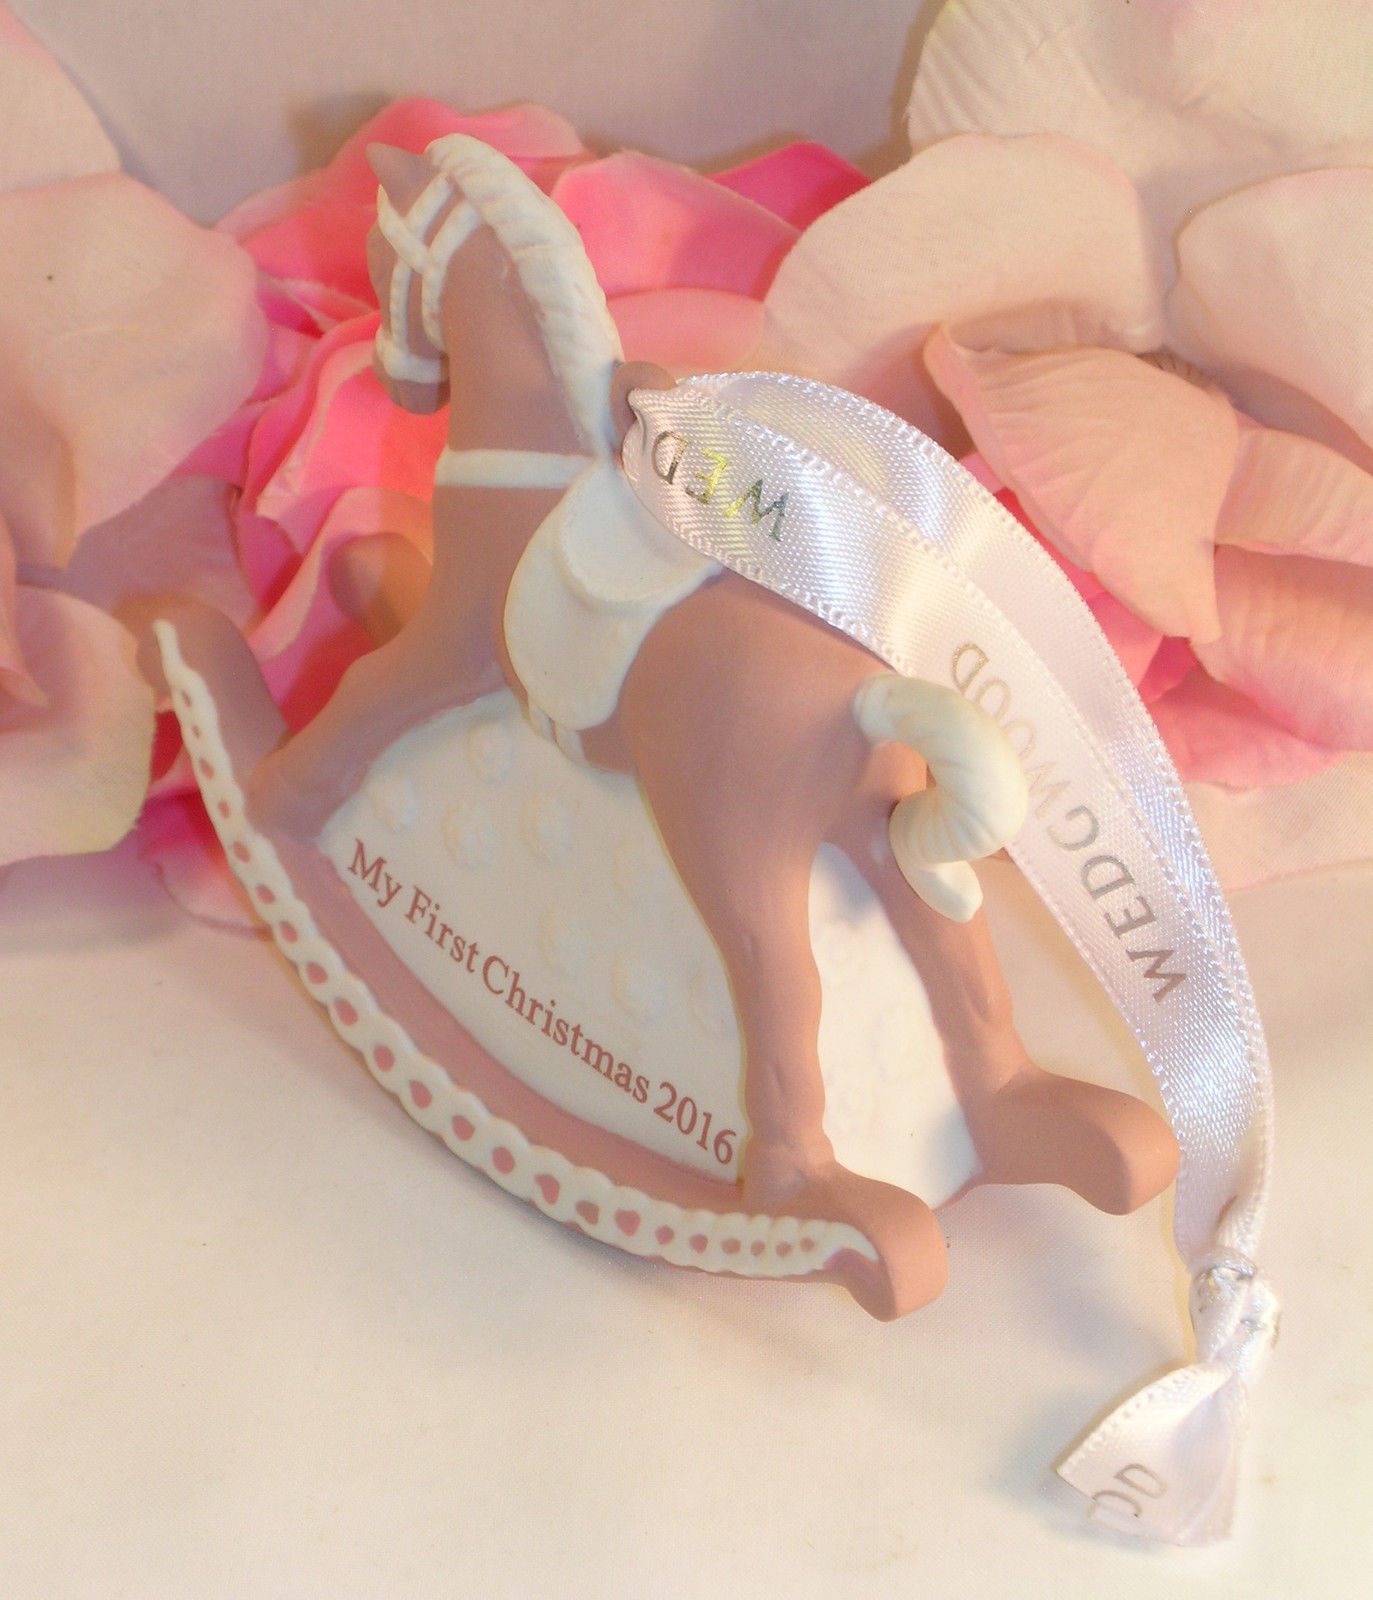 New Wedgwood Pink Jaspeware Baby 1ST First Christmas Rocking Horse Ornament 2016 image 6